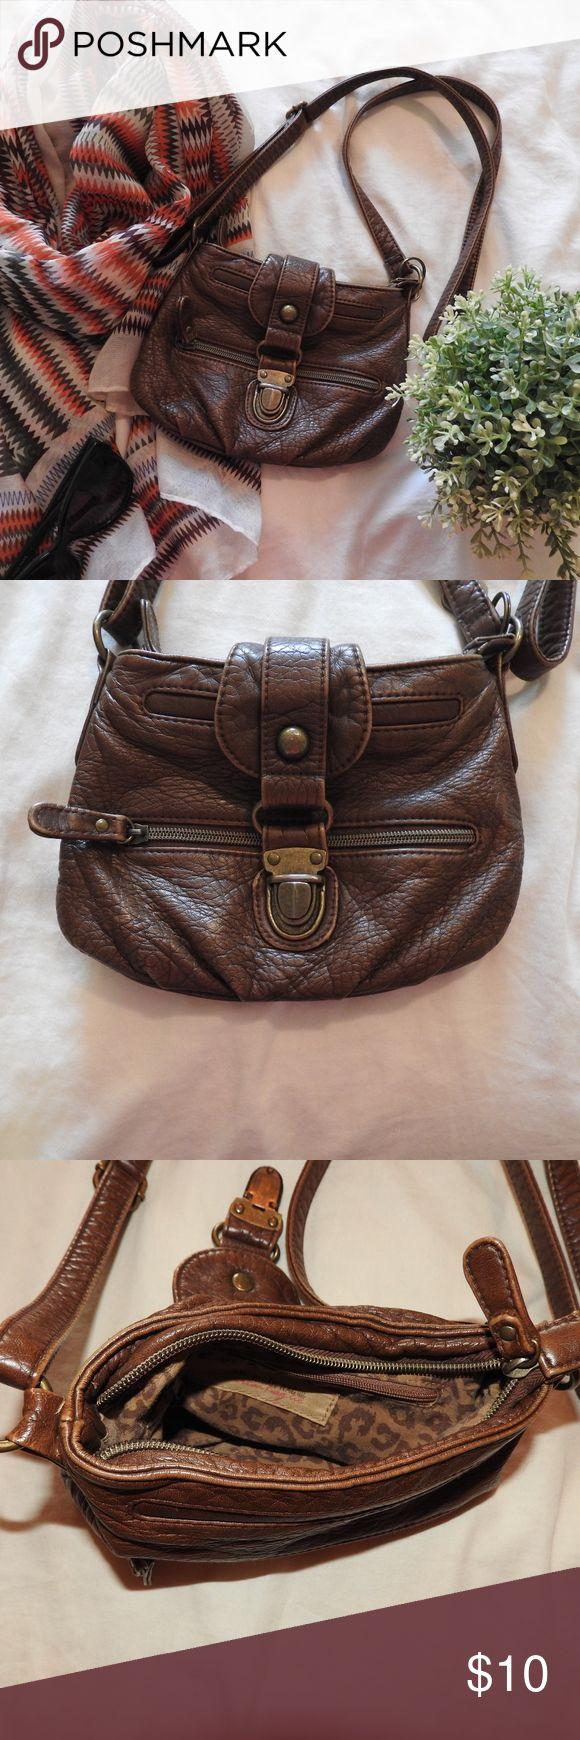 American Rag Crossbody Ecu Brown Vegan Leather Bag Zippered Tp With Inside Pocket